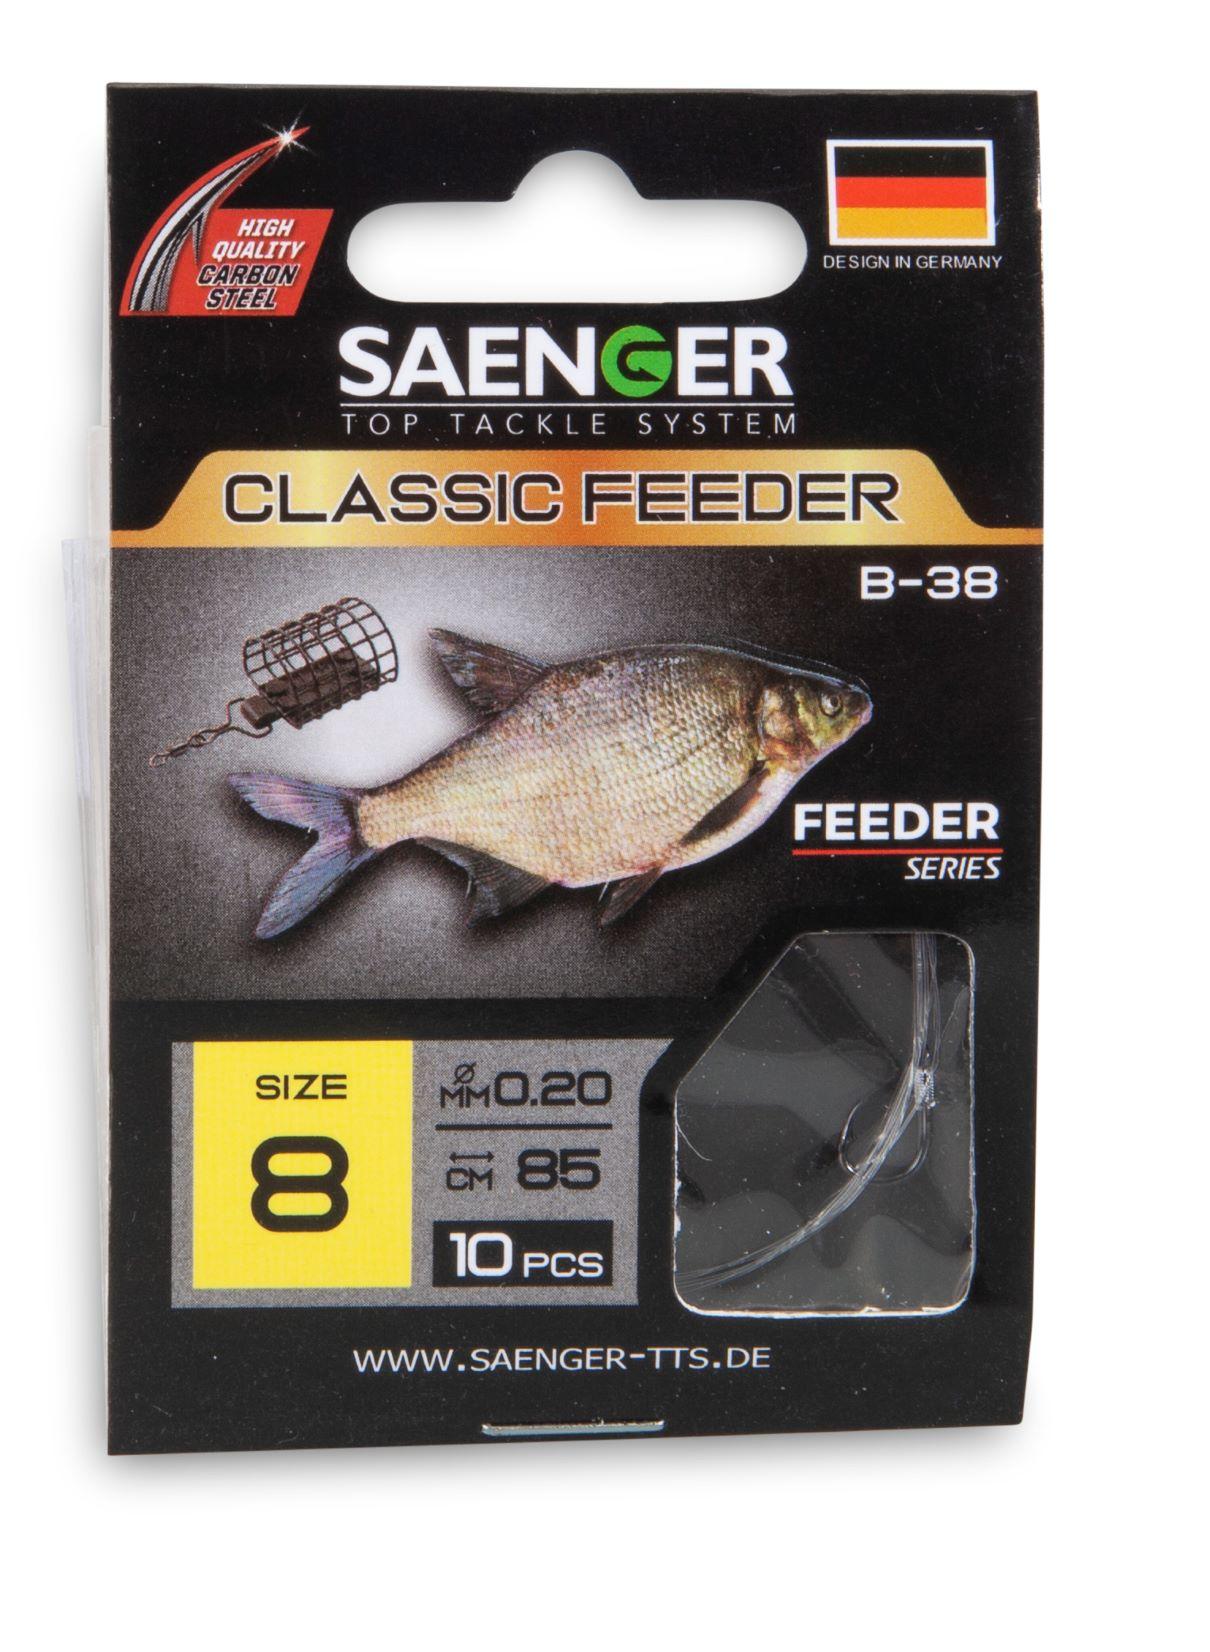 Saenger Návazec na feeder Classic Feeder vel. 16, 10 ks/bal